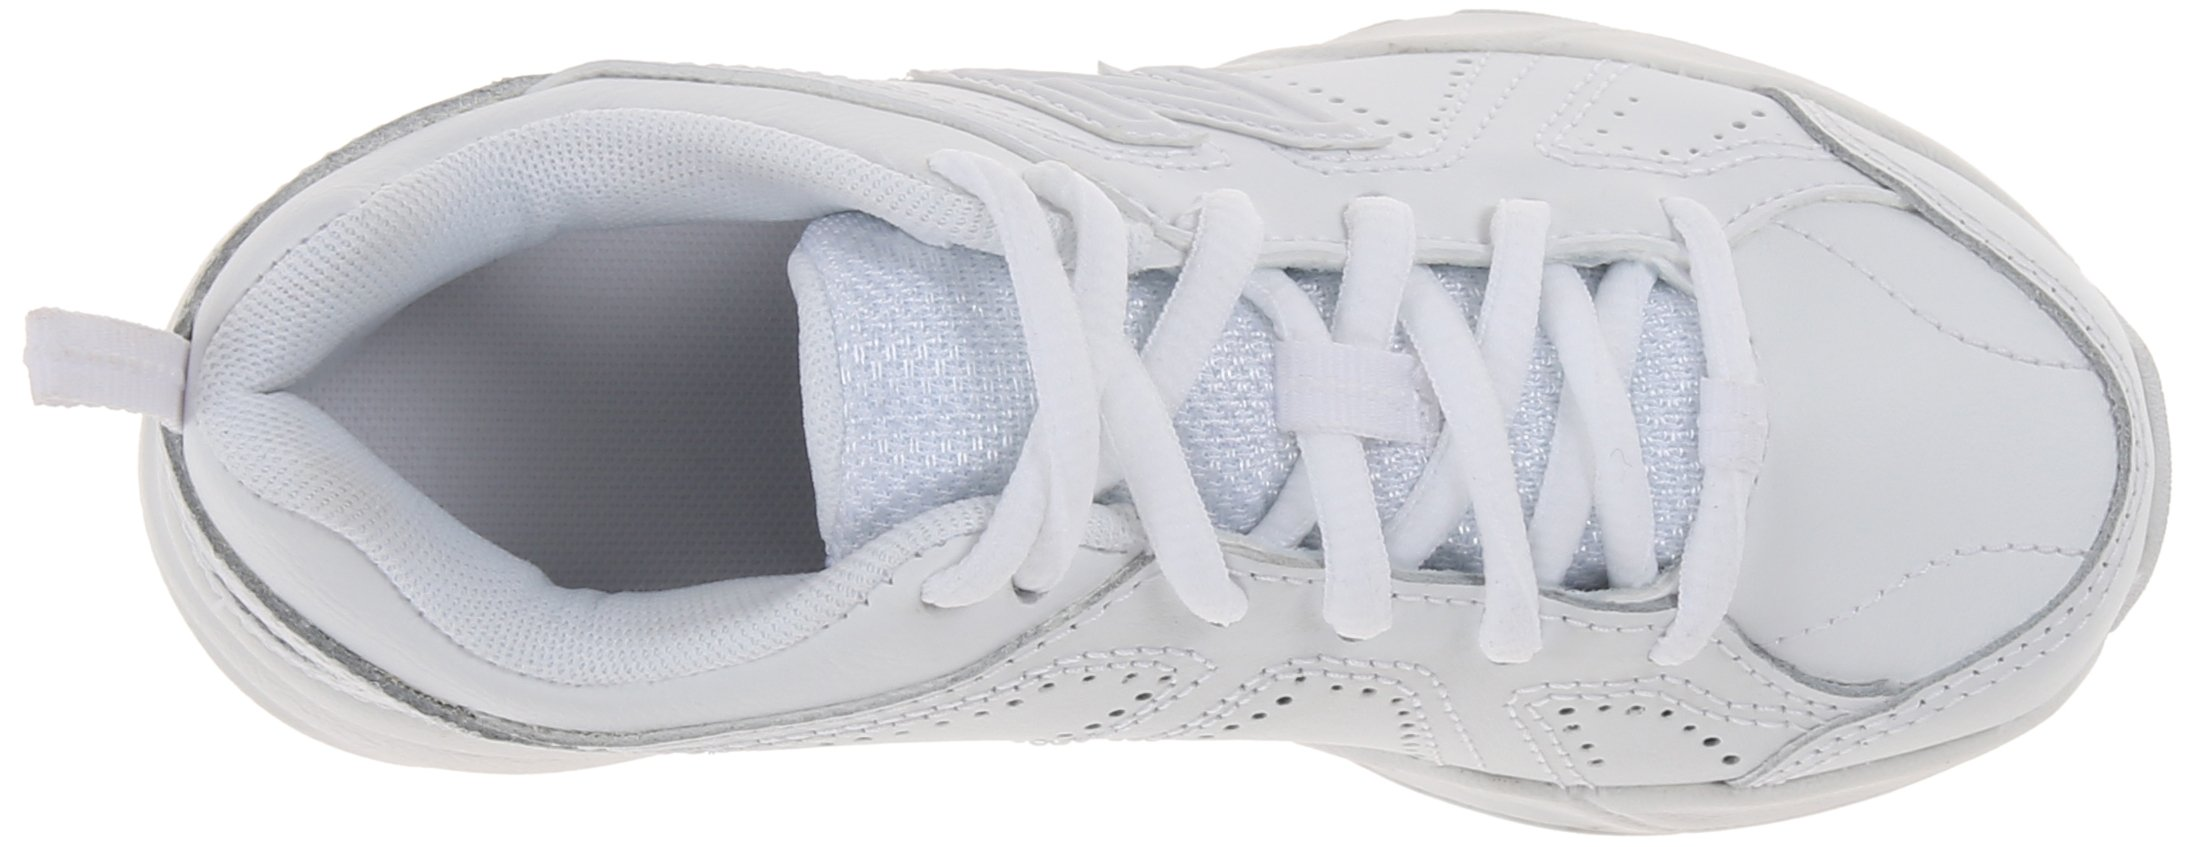 New Balance Boys KX624 Lace-Up Training Shoe ,White,13.5 M US Little Kid by New Balance (Image #7)